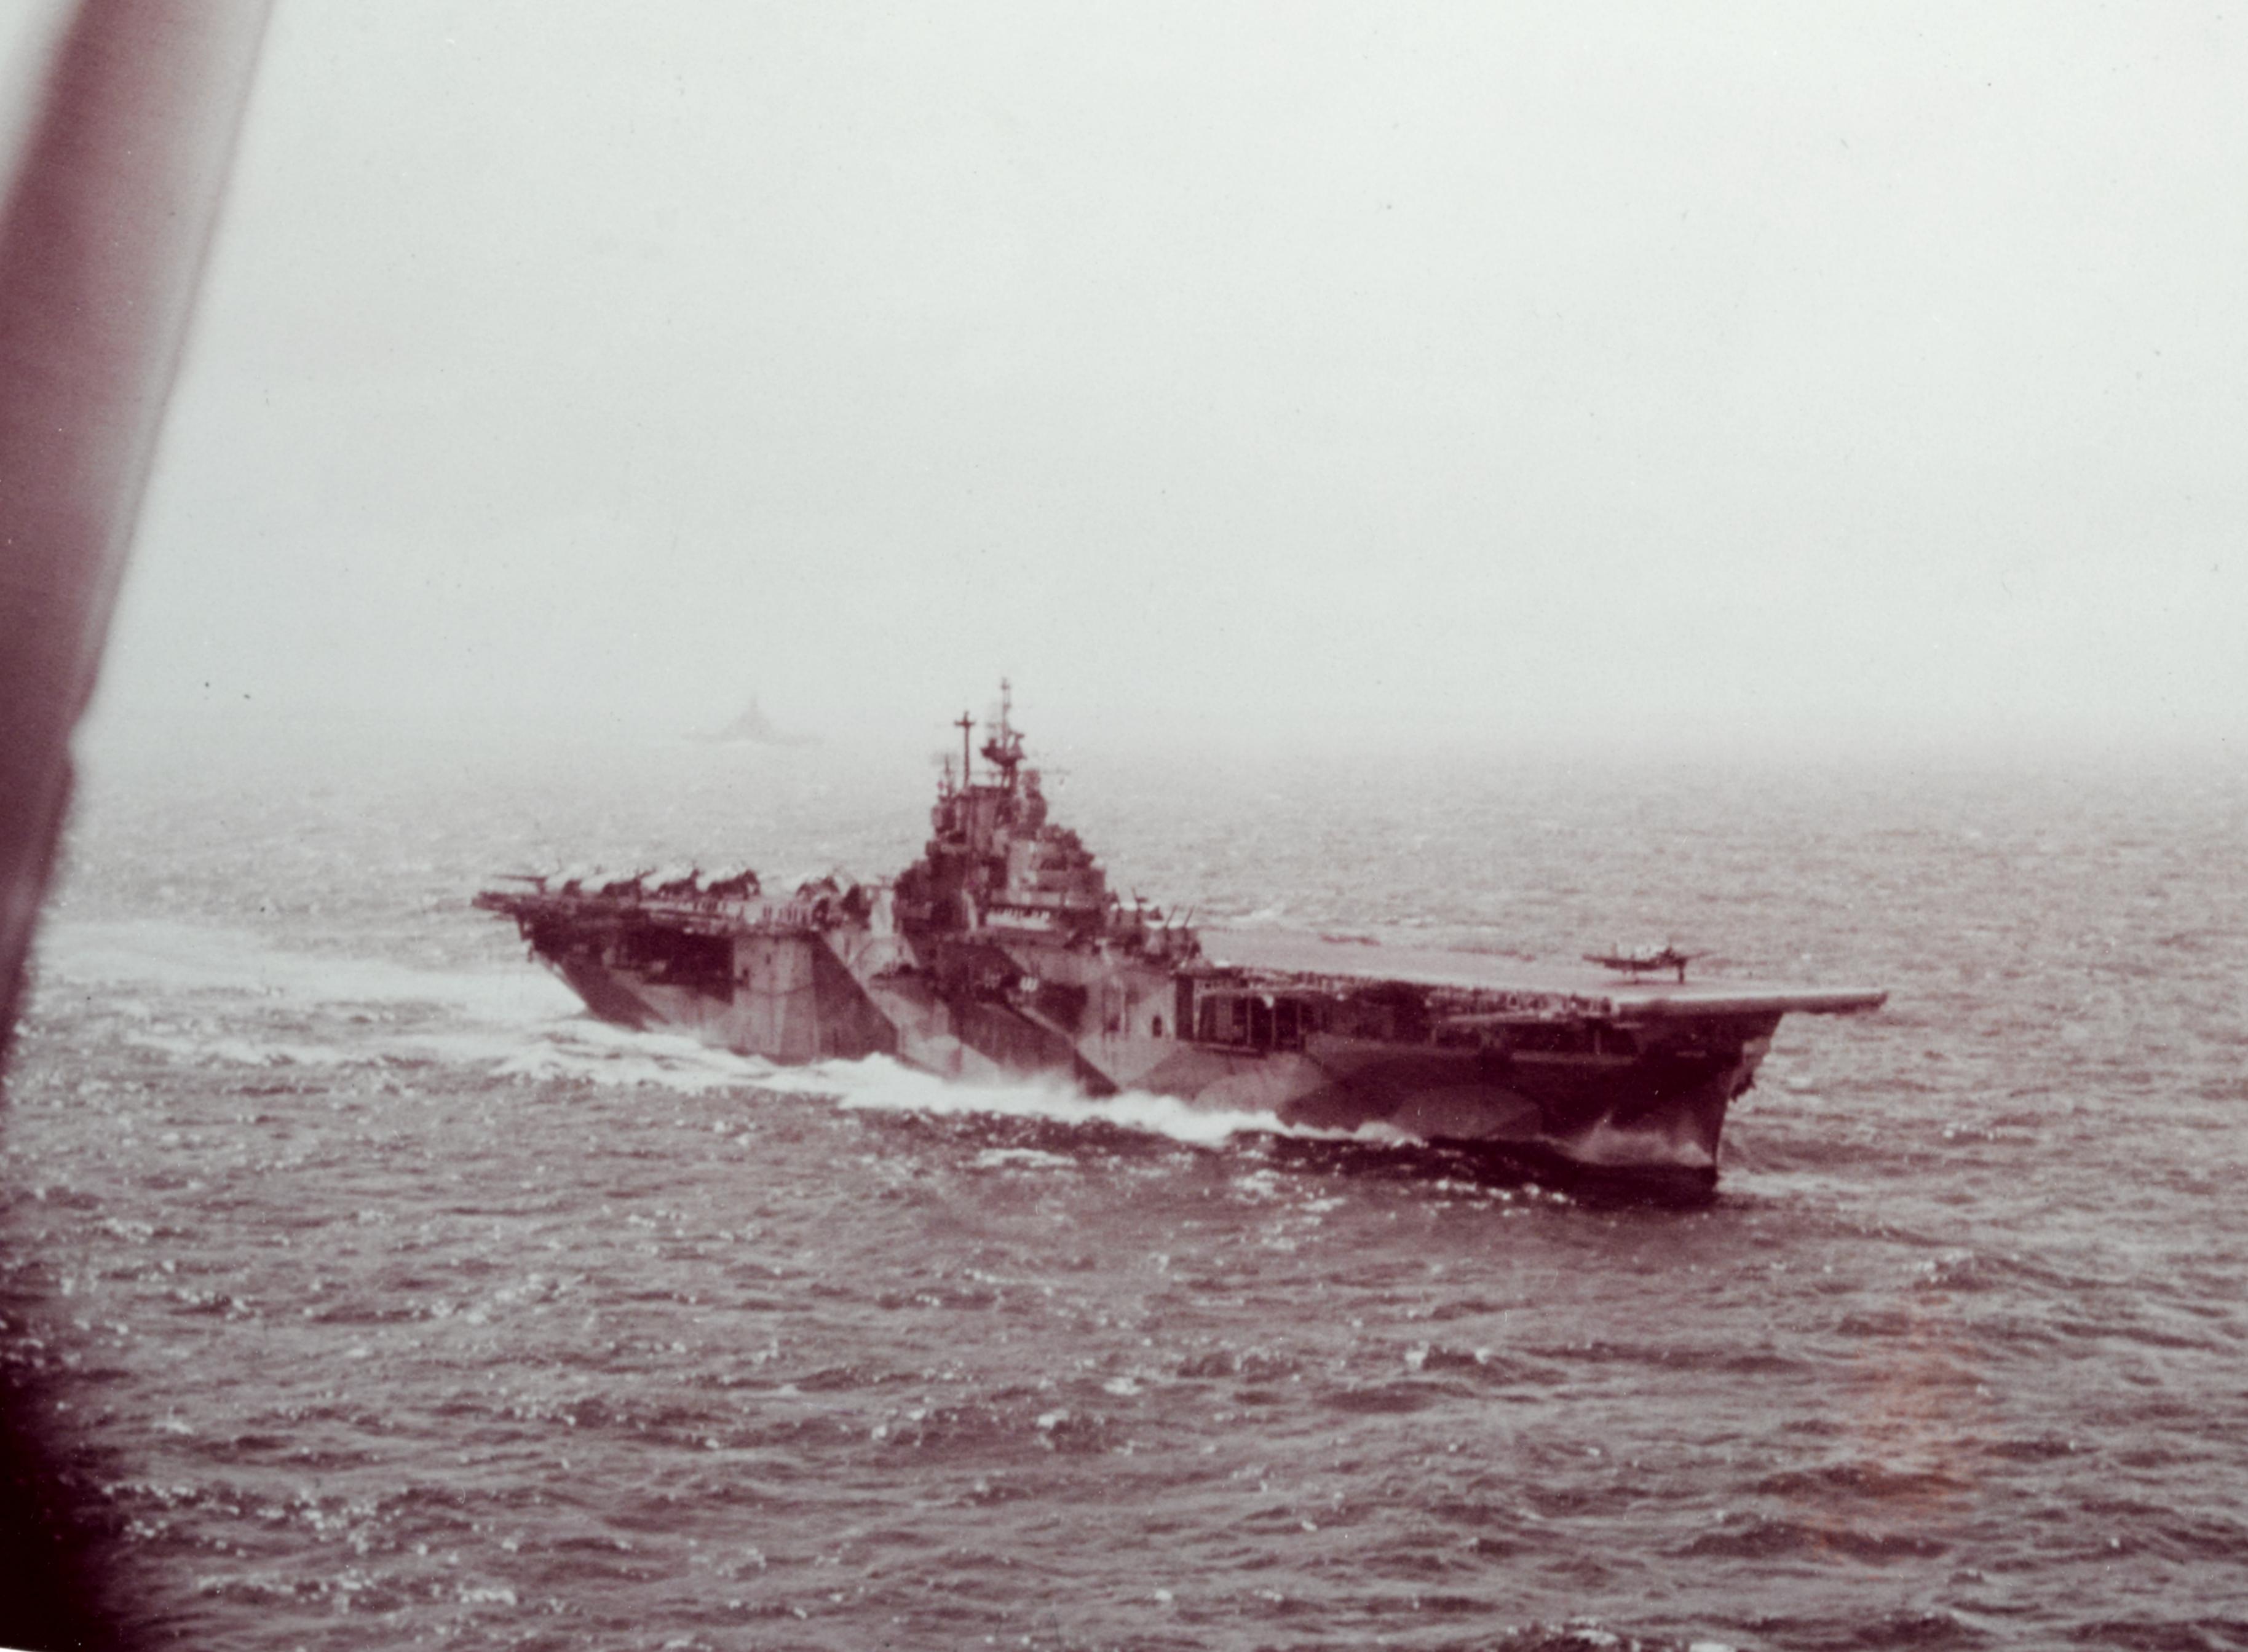 La Sultana Group has put up for sale the former famous Soviet reconnaissance ship